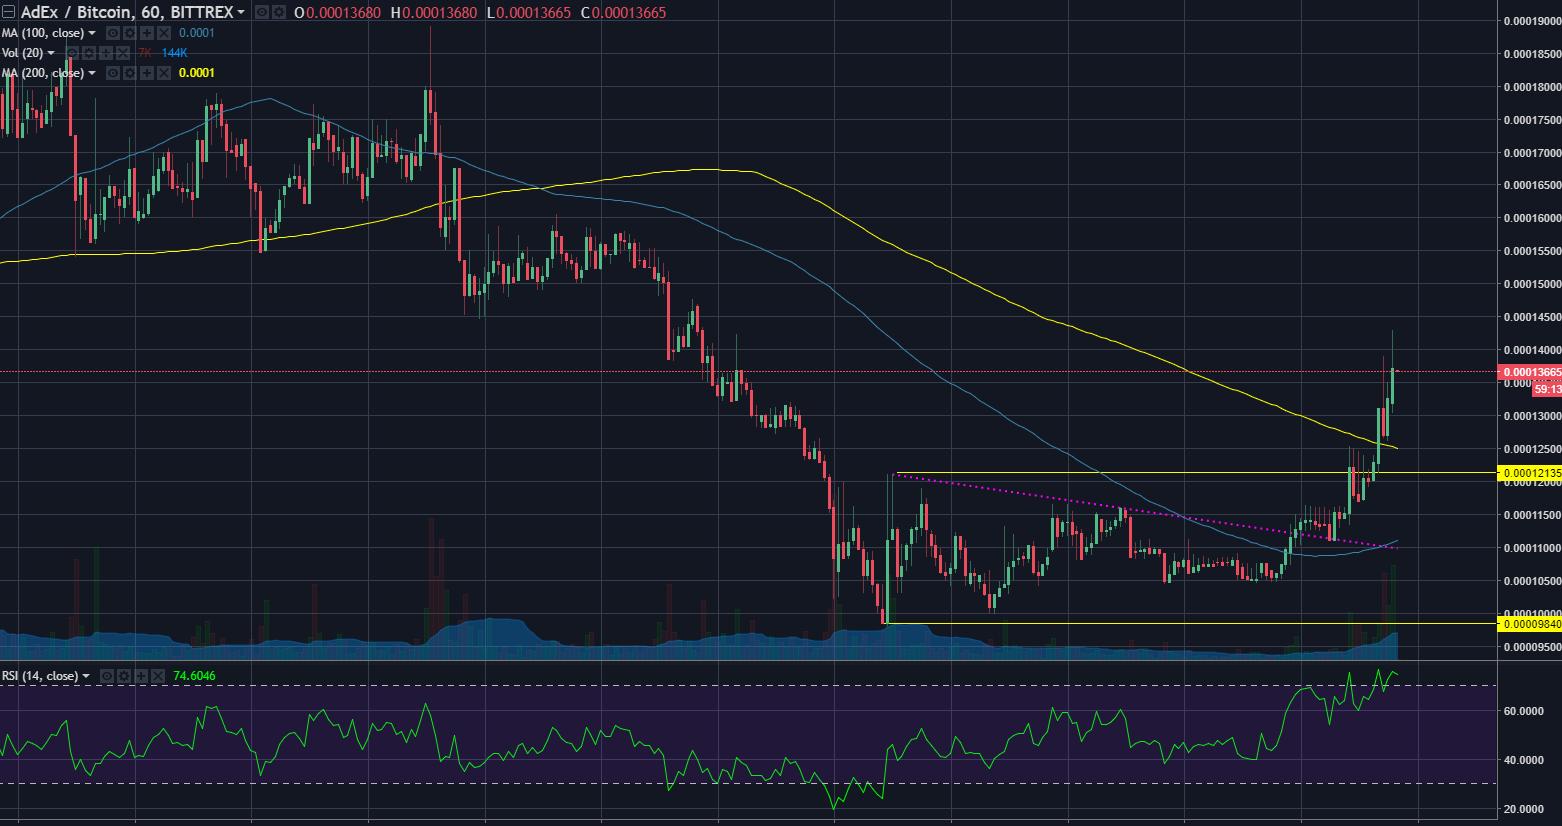 courtesy of Tradingview:Bittrex